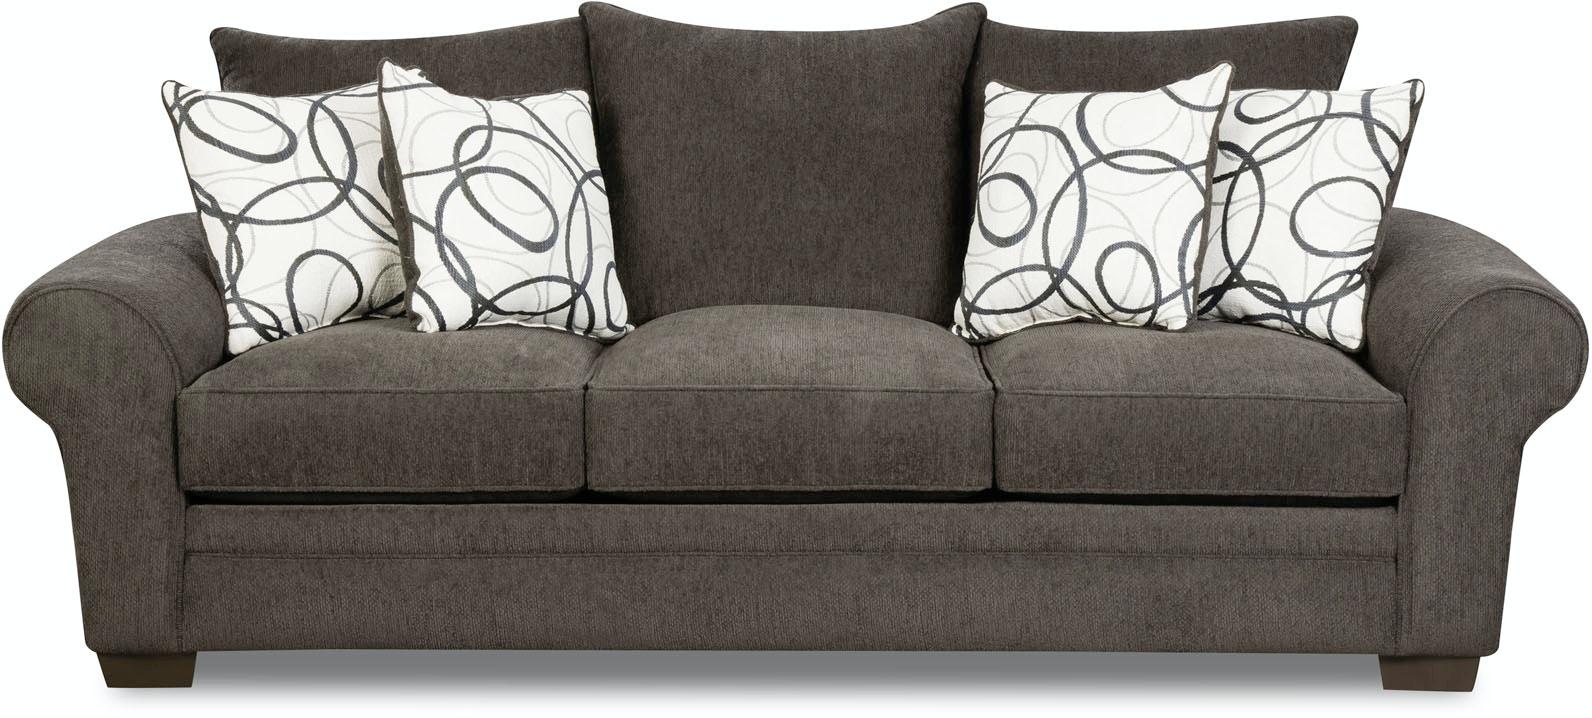 Corinthian Living Room Othello Sofa 050498 Furniture Fair Cincinnati Dayton Oh And Northern Ky